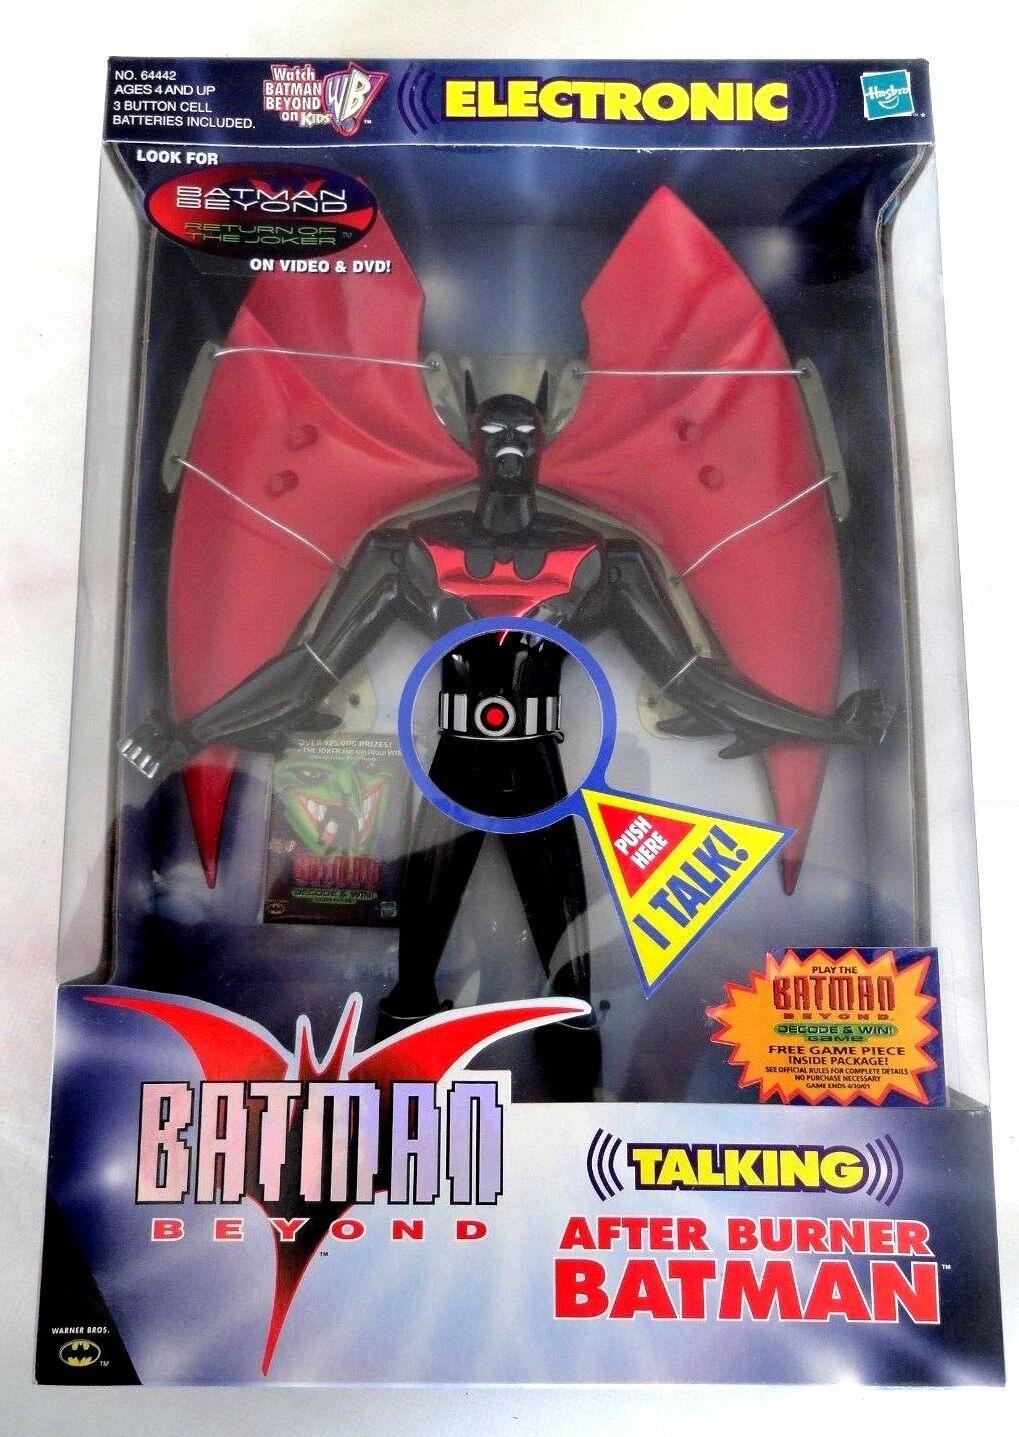 BATMAN BEYOND  10 INCH ELECTRONIC TALKING AFTER BURNER BATMAN ACTION FIGURE NEW